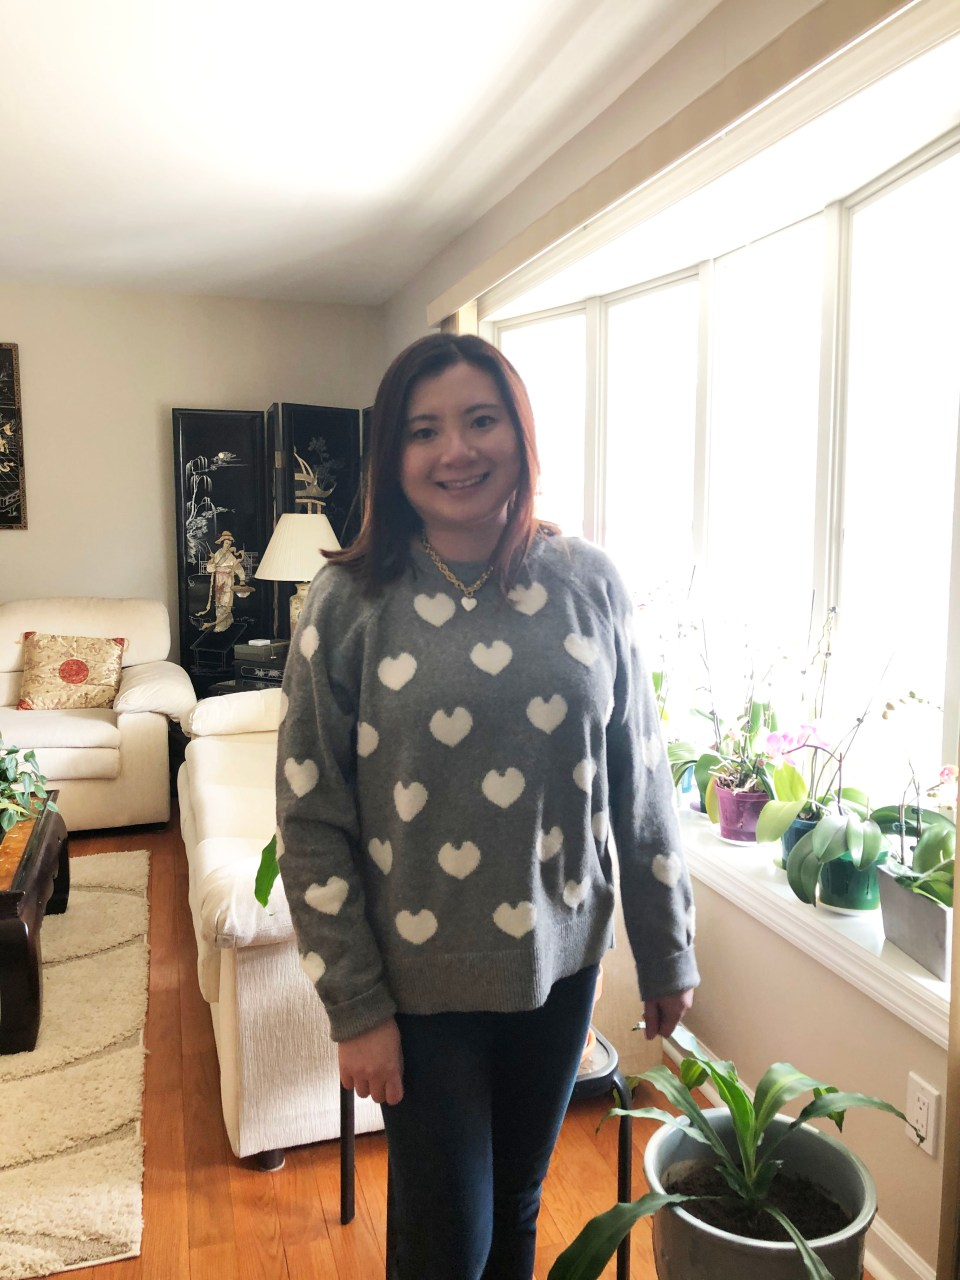 White Heart Sweater 6